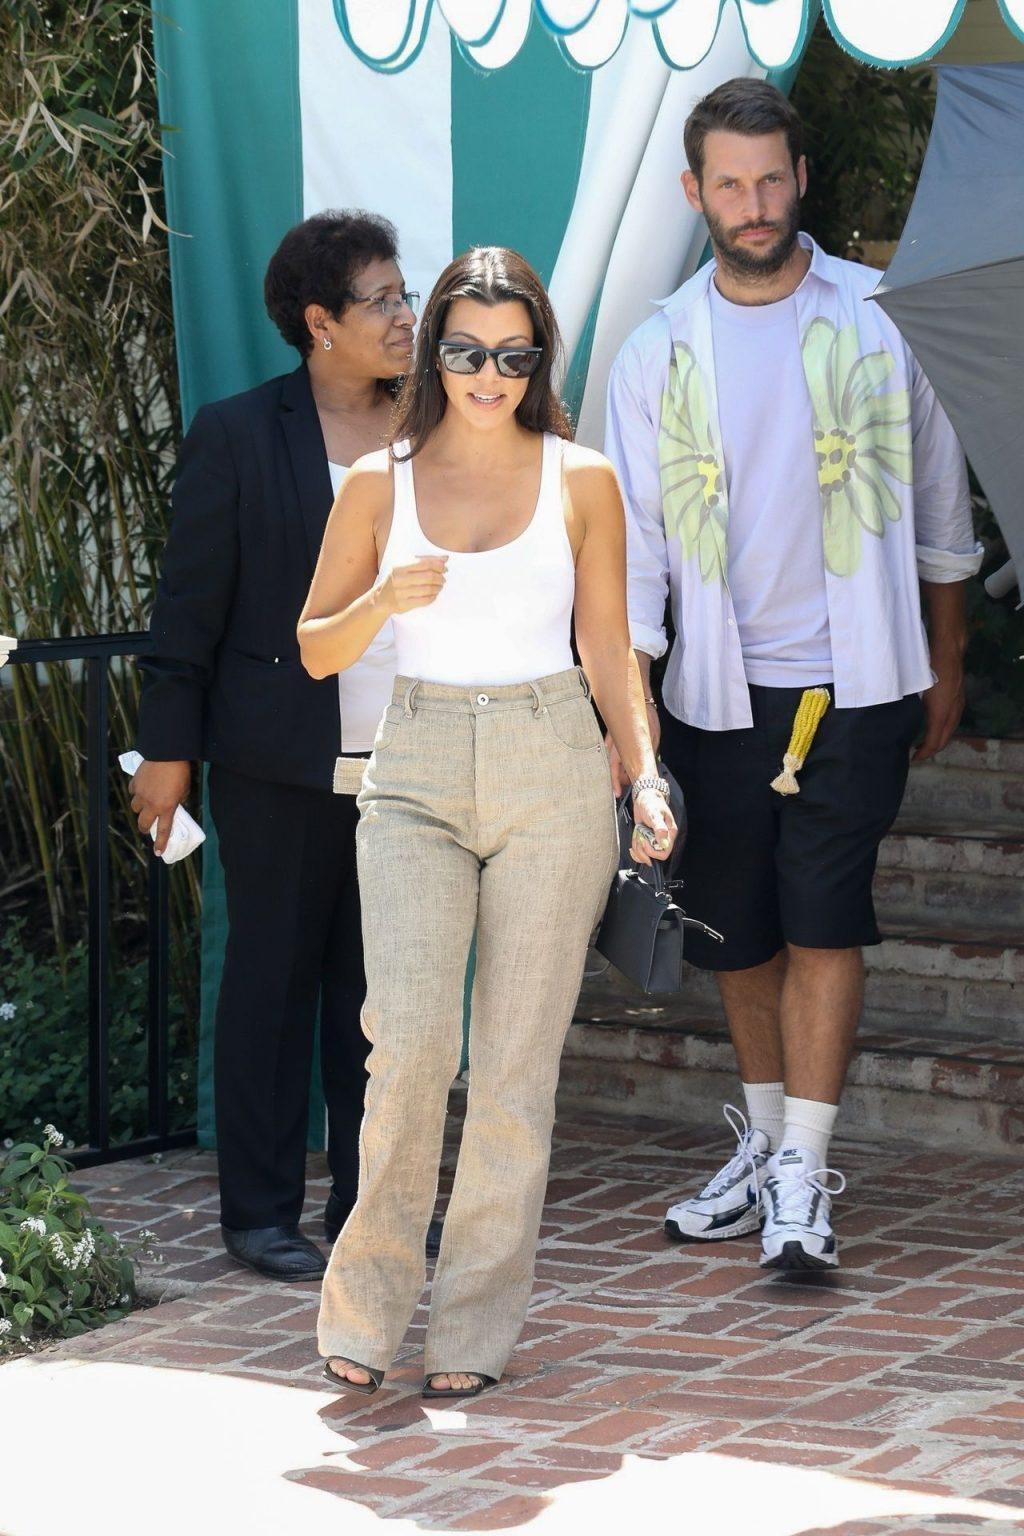 Kourtney Kardashian See Through Thefappeningblog Com 44 1024